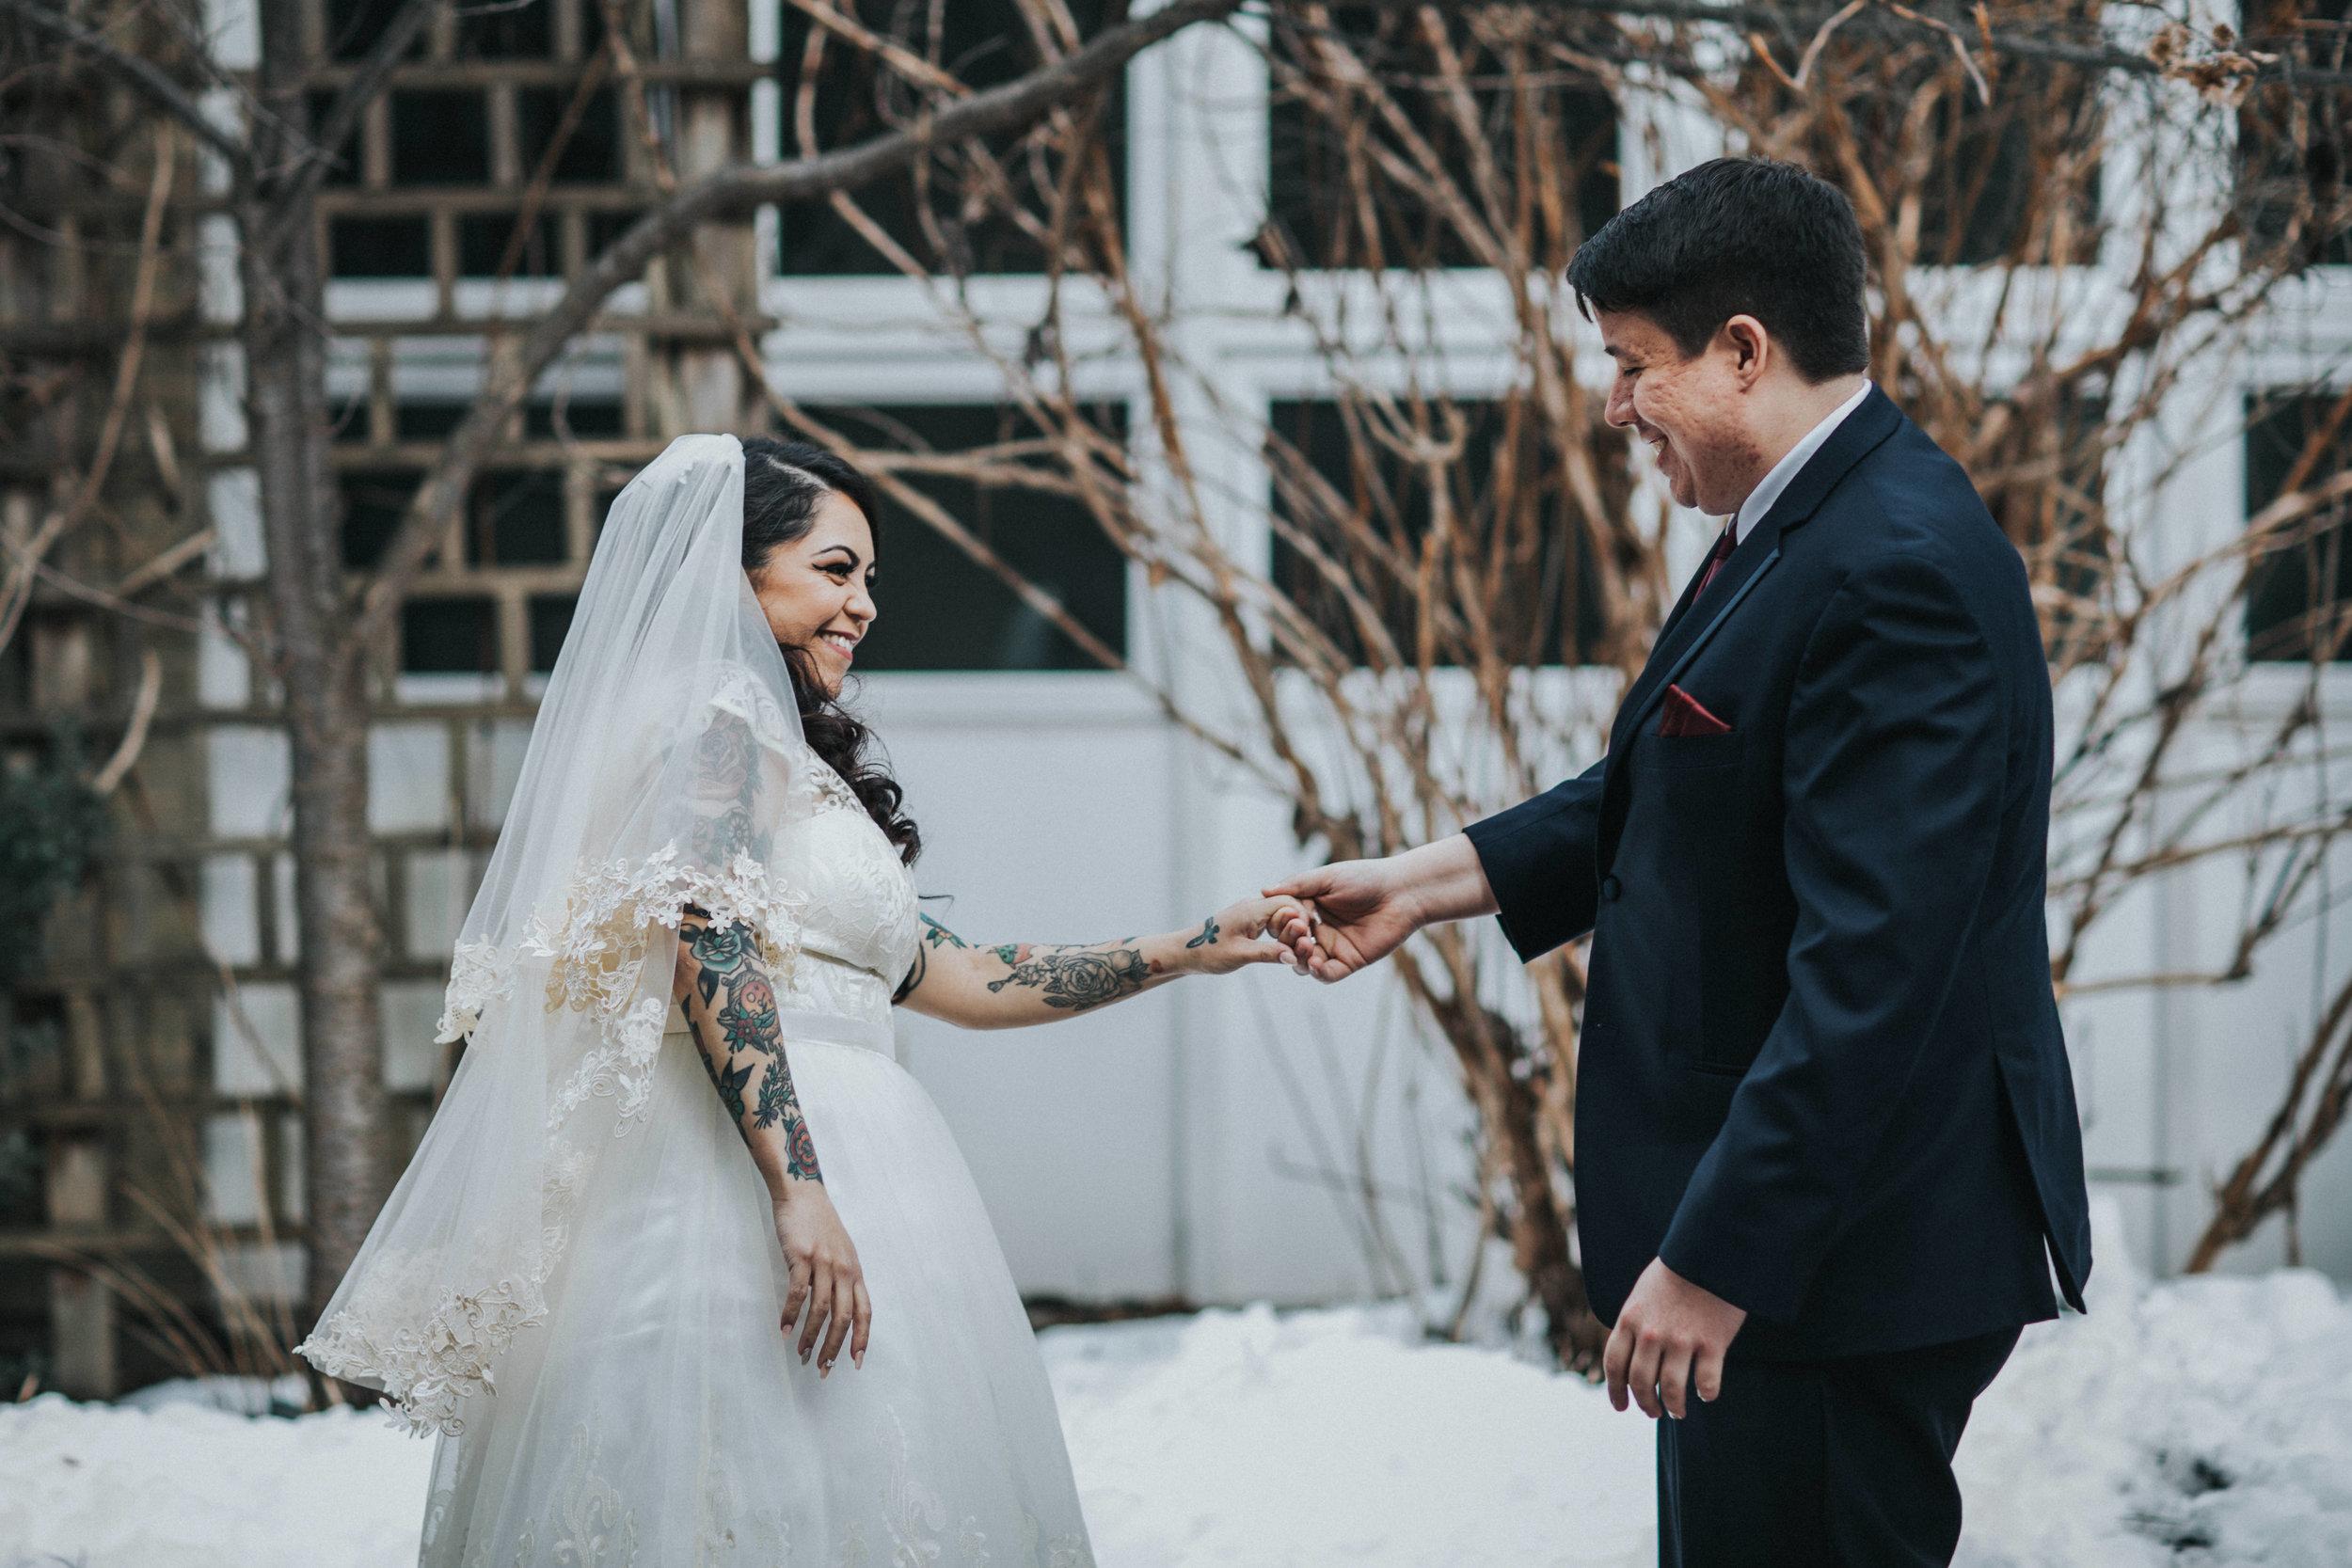 New-Jersey-Wedding-Photographer-ReceptionCenter-Valeria&Mike-First-Look-Bride&Groom (57 of 69).jpg